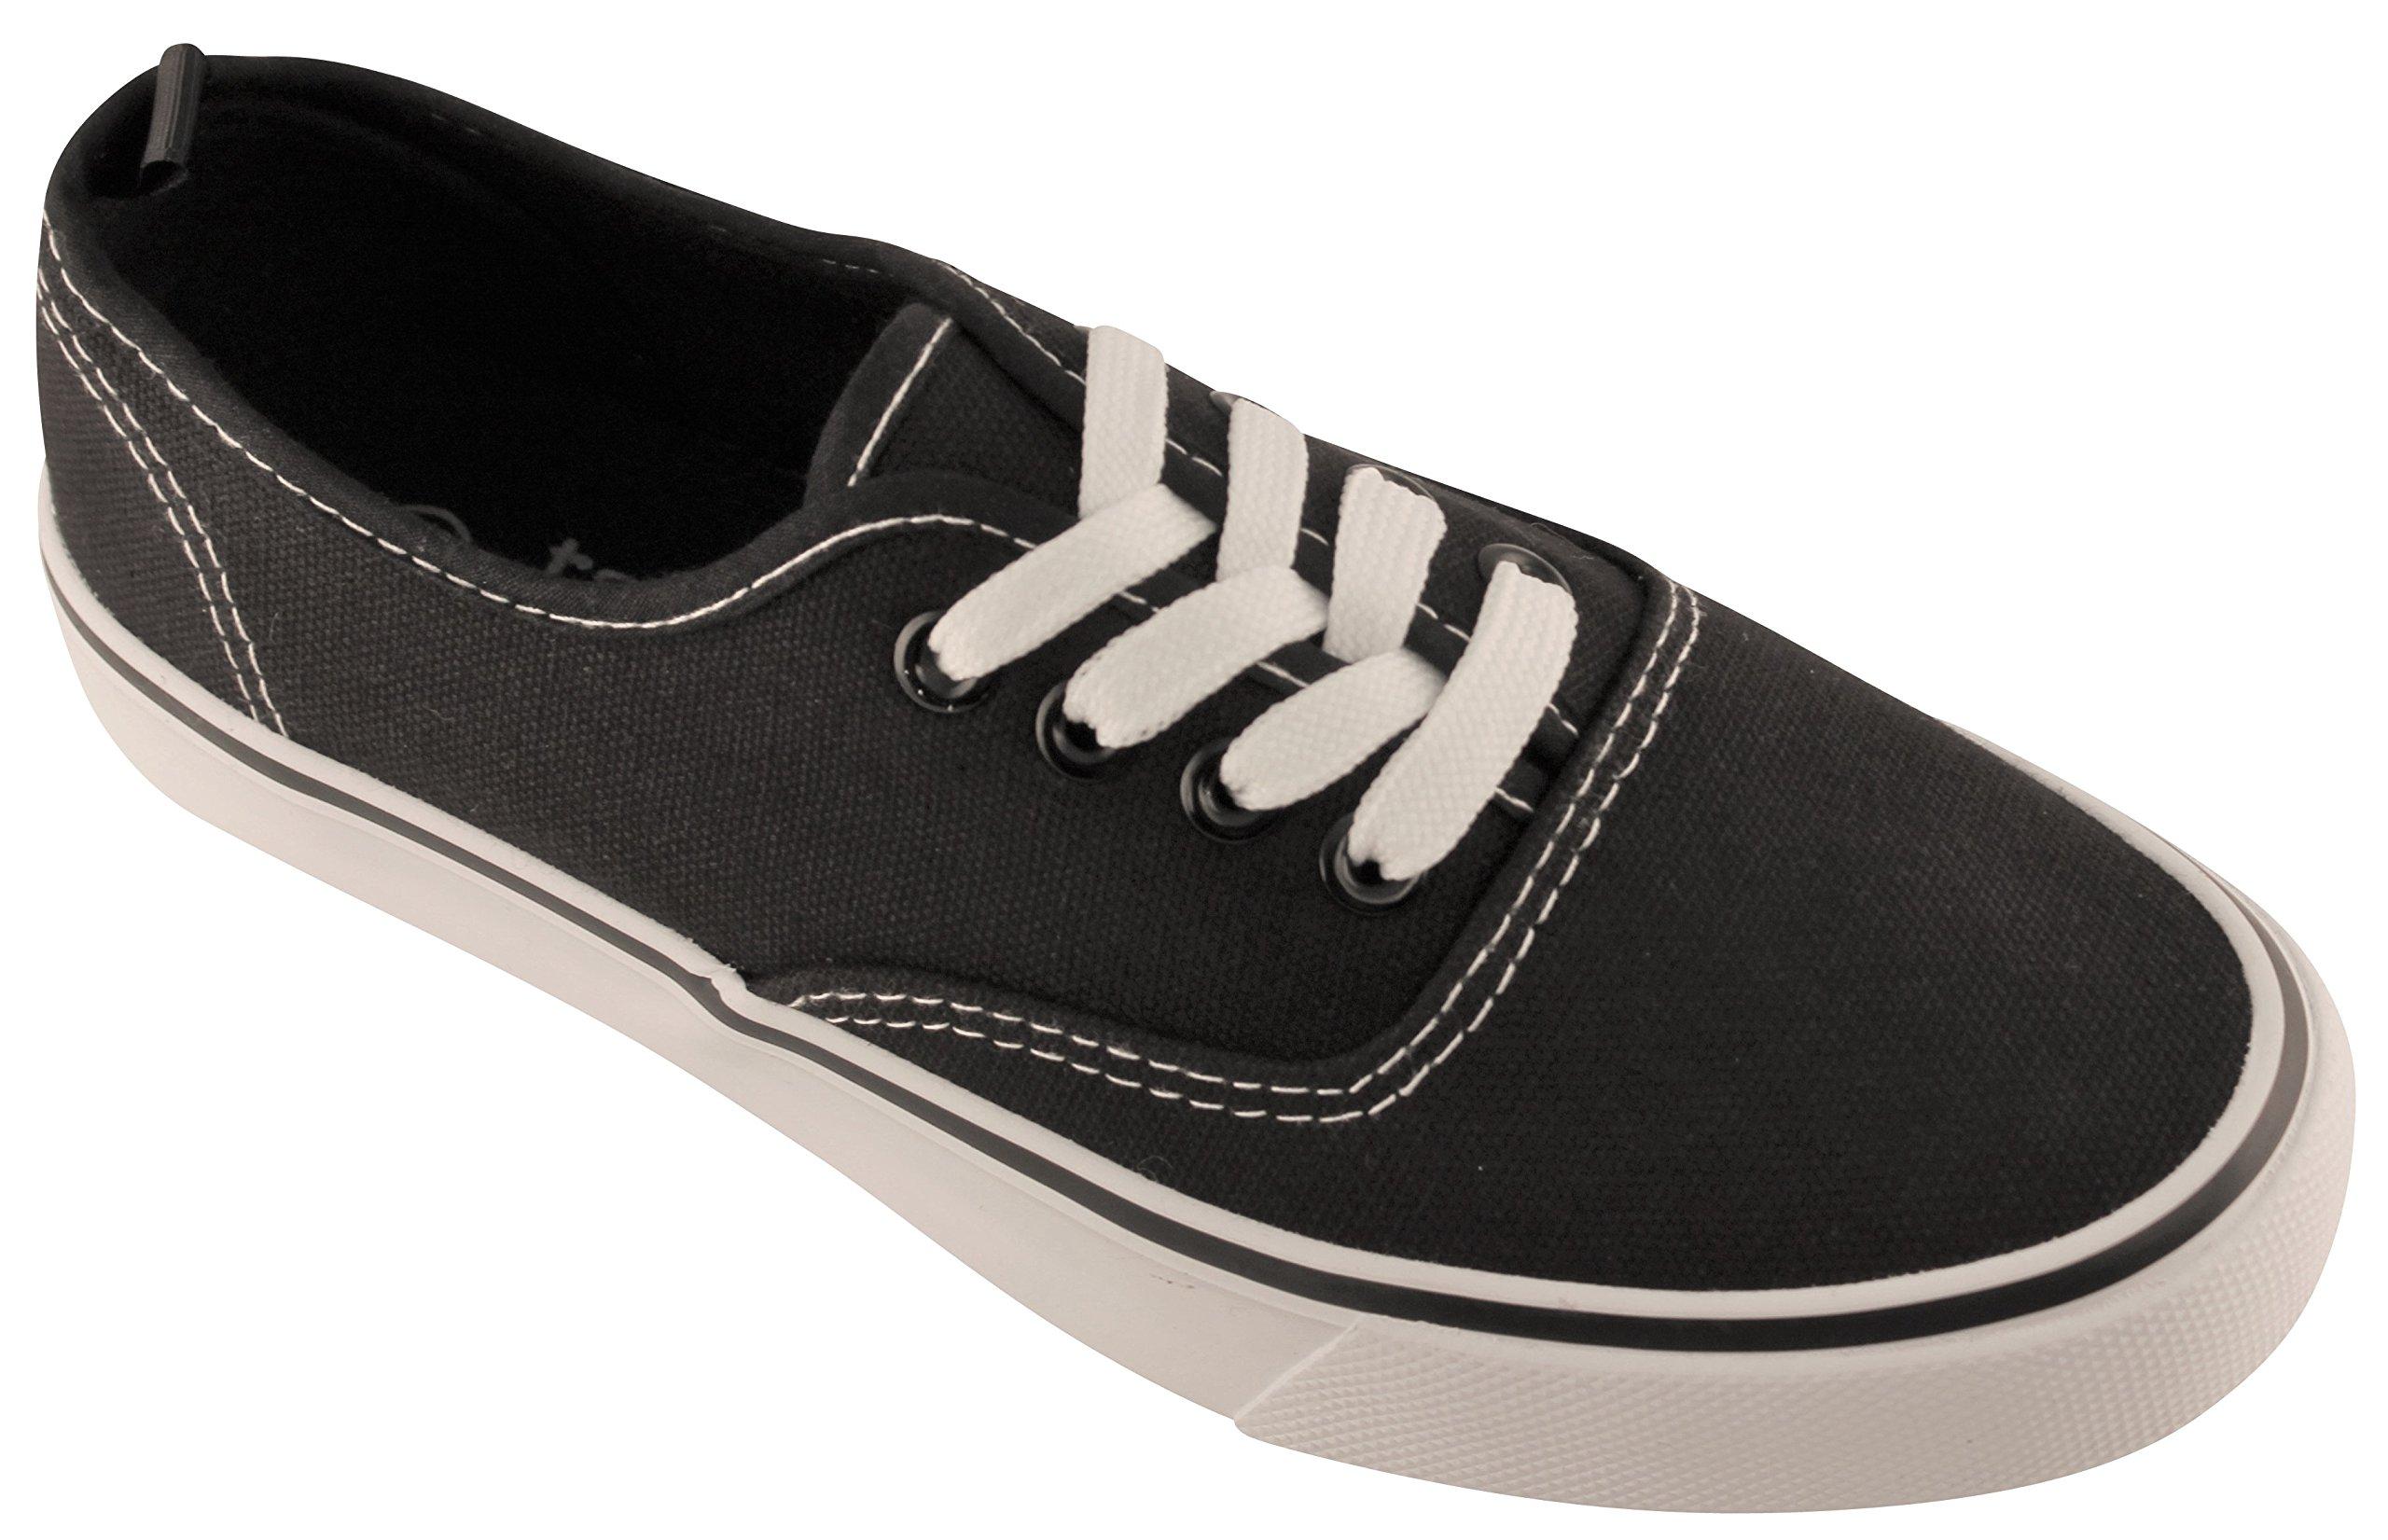 Take A Walk Lace up Women - Many Styles Avail. (6, Black/White)